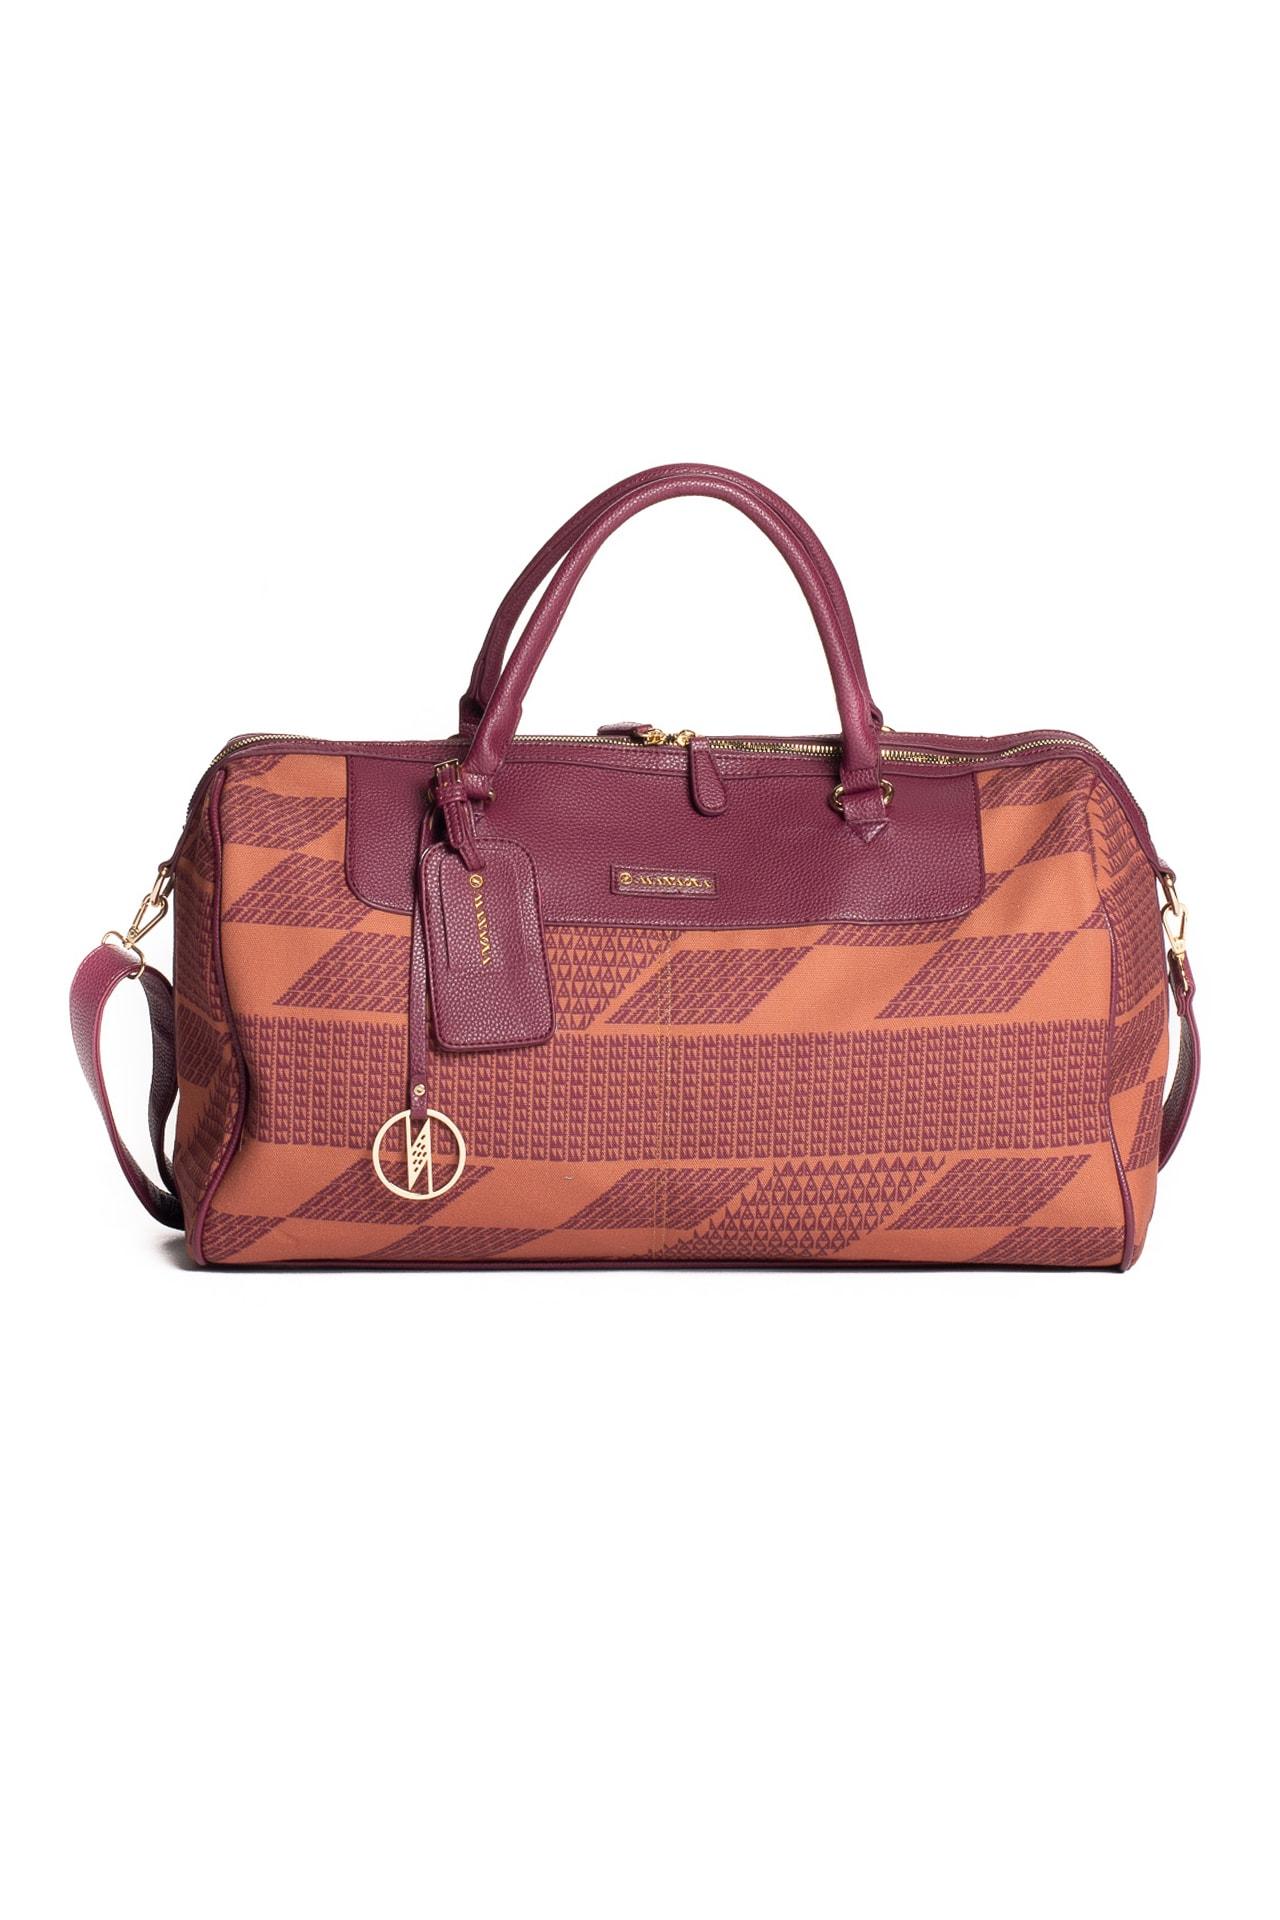 Island Hopper Bag in Red Mahogay/Copper